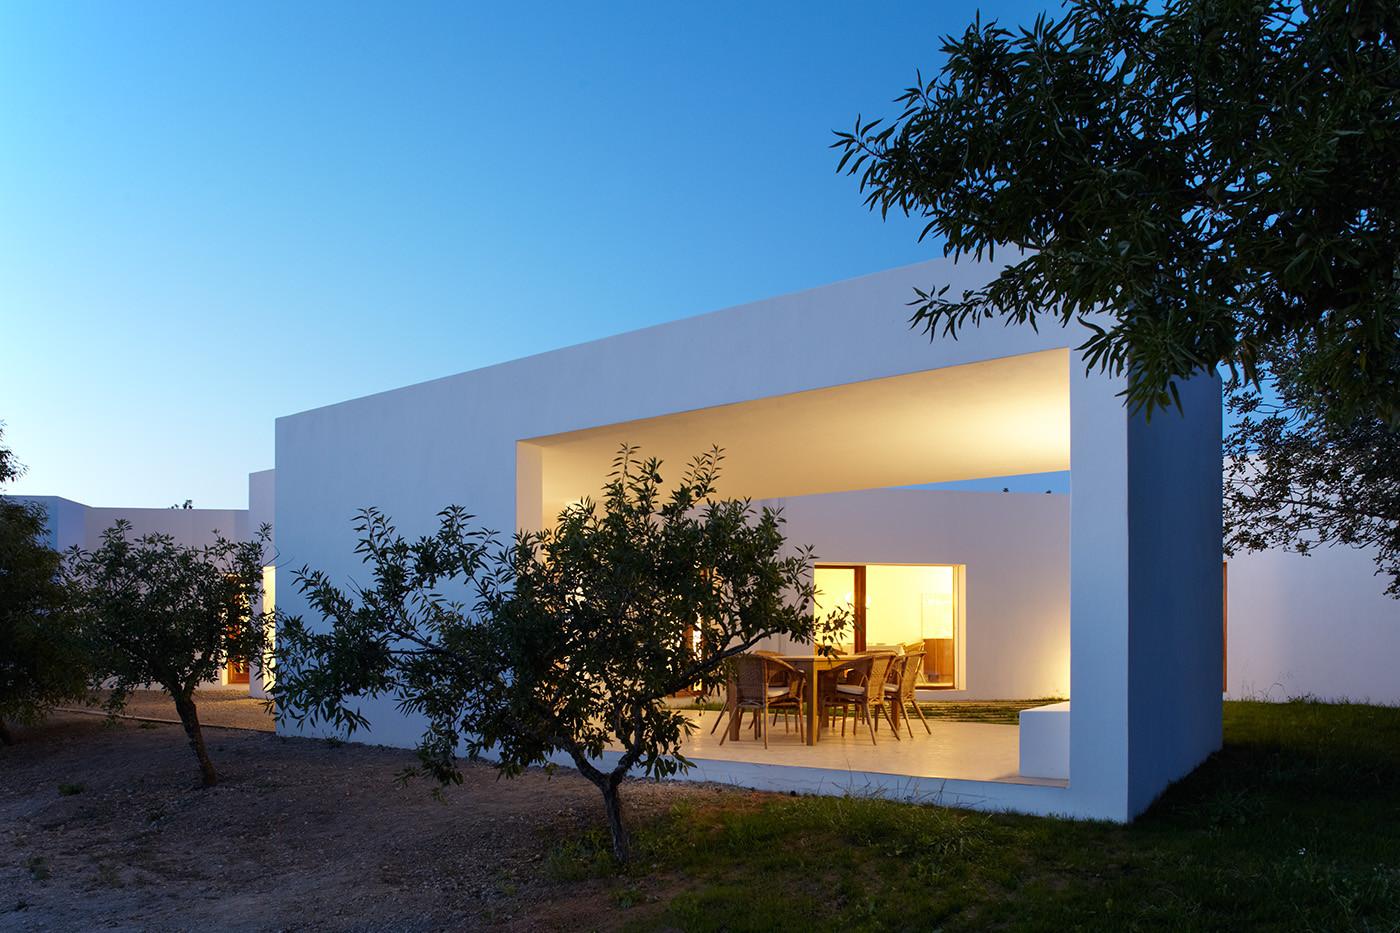 House in Ibiza 2 / Roberto Ercilla, © Xabier Durán Herrera